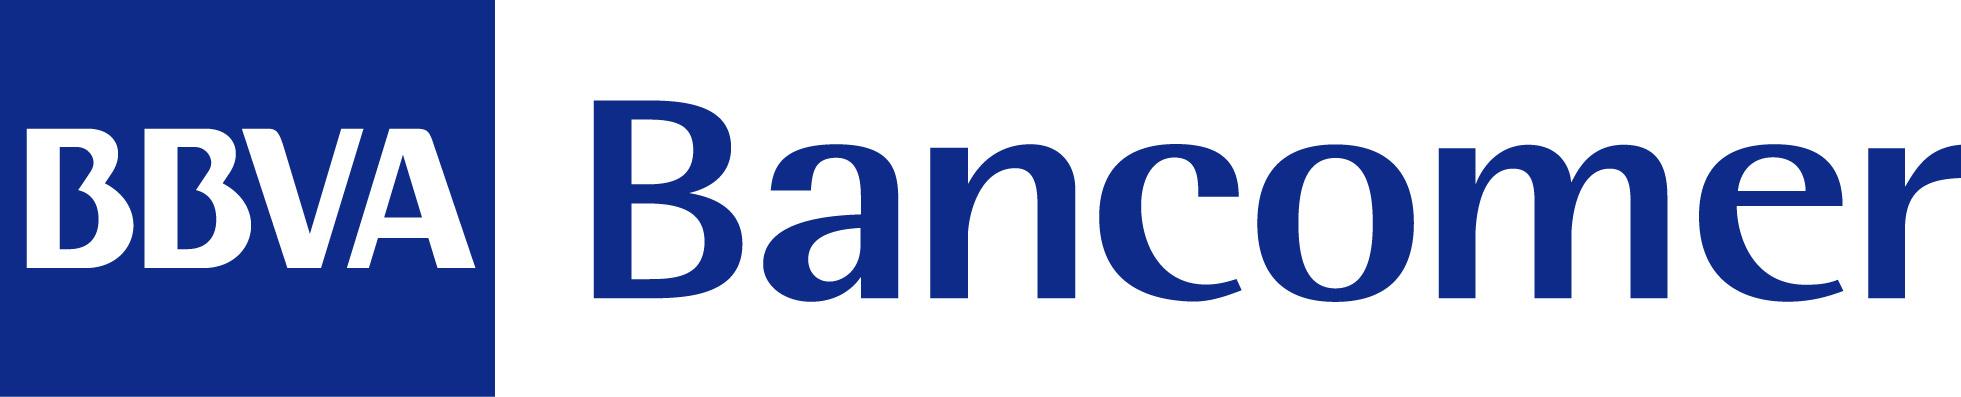 Fondos de inversion BBVA Bancomer